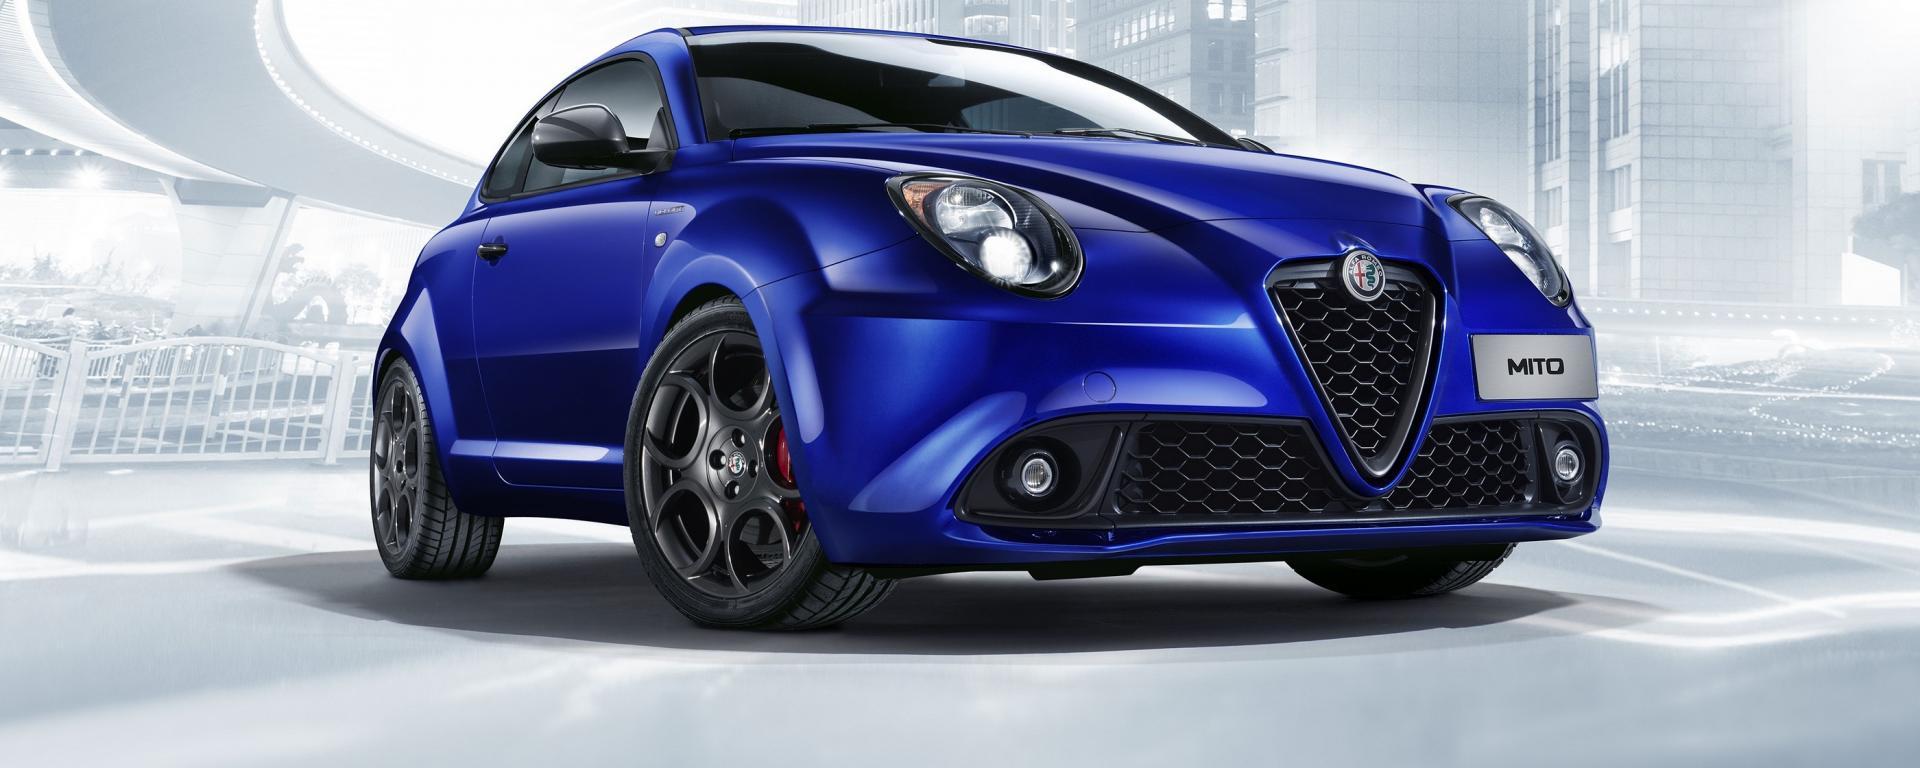 Alfa Romeo Mito Torino